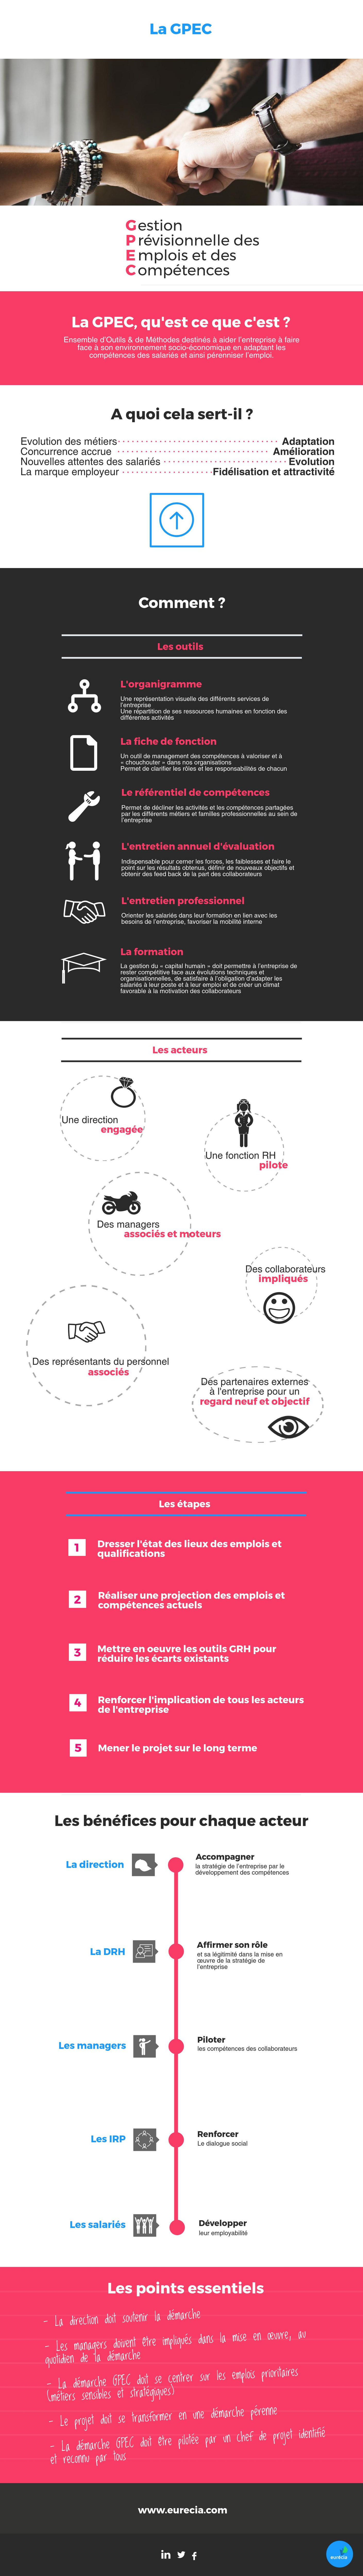 Infographie GPEC